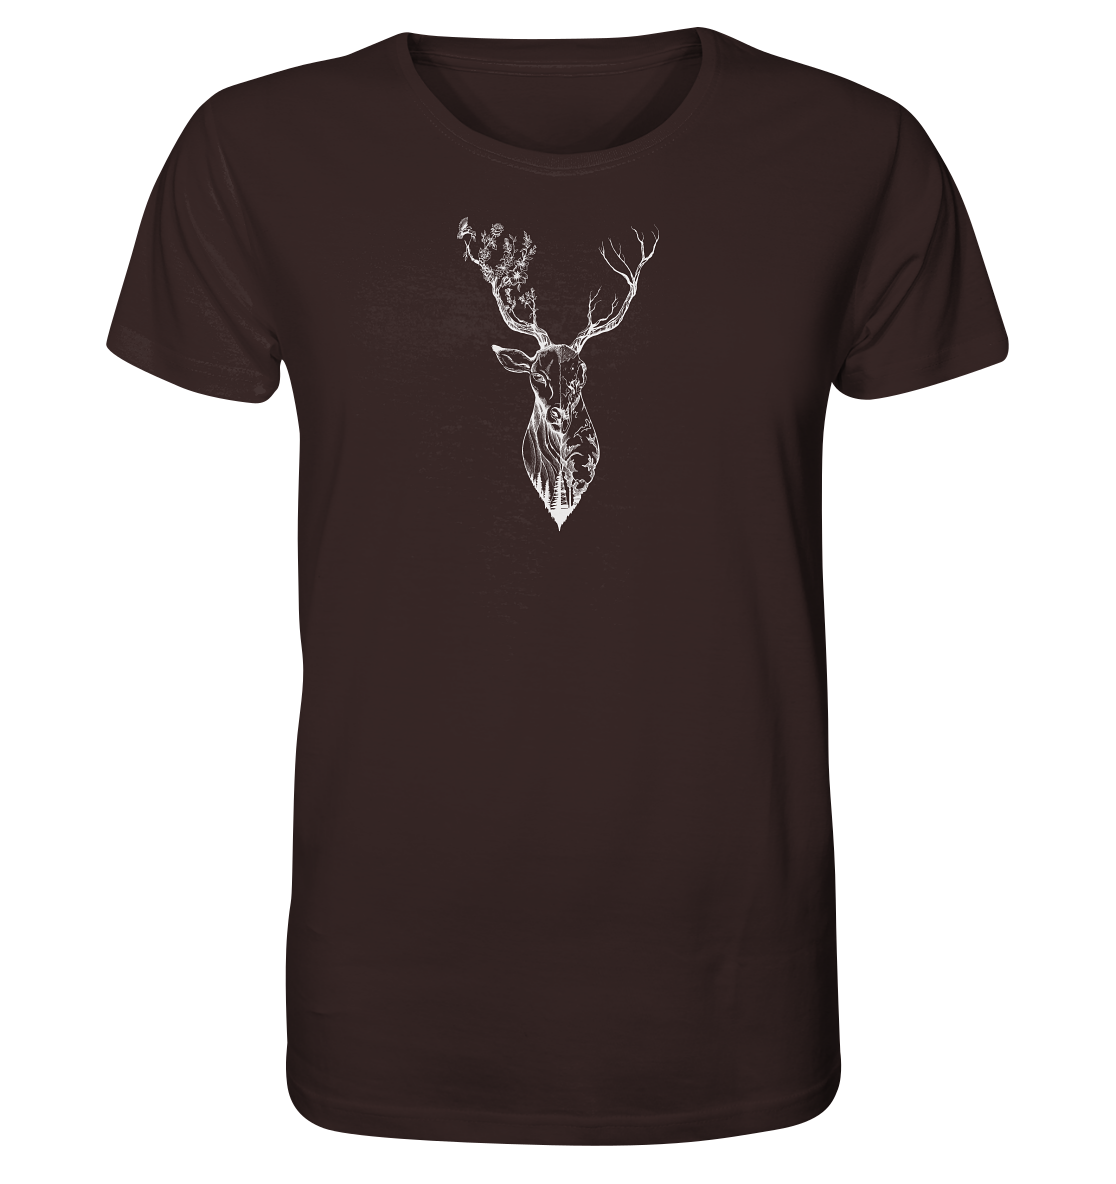 front-organic-shirt-372726-1116x-7.png